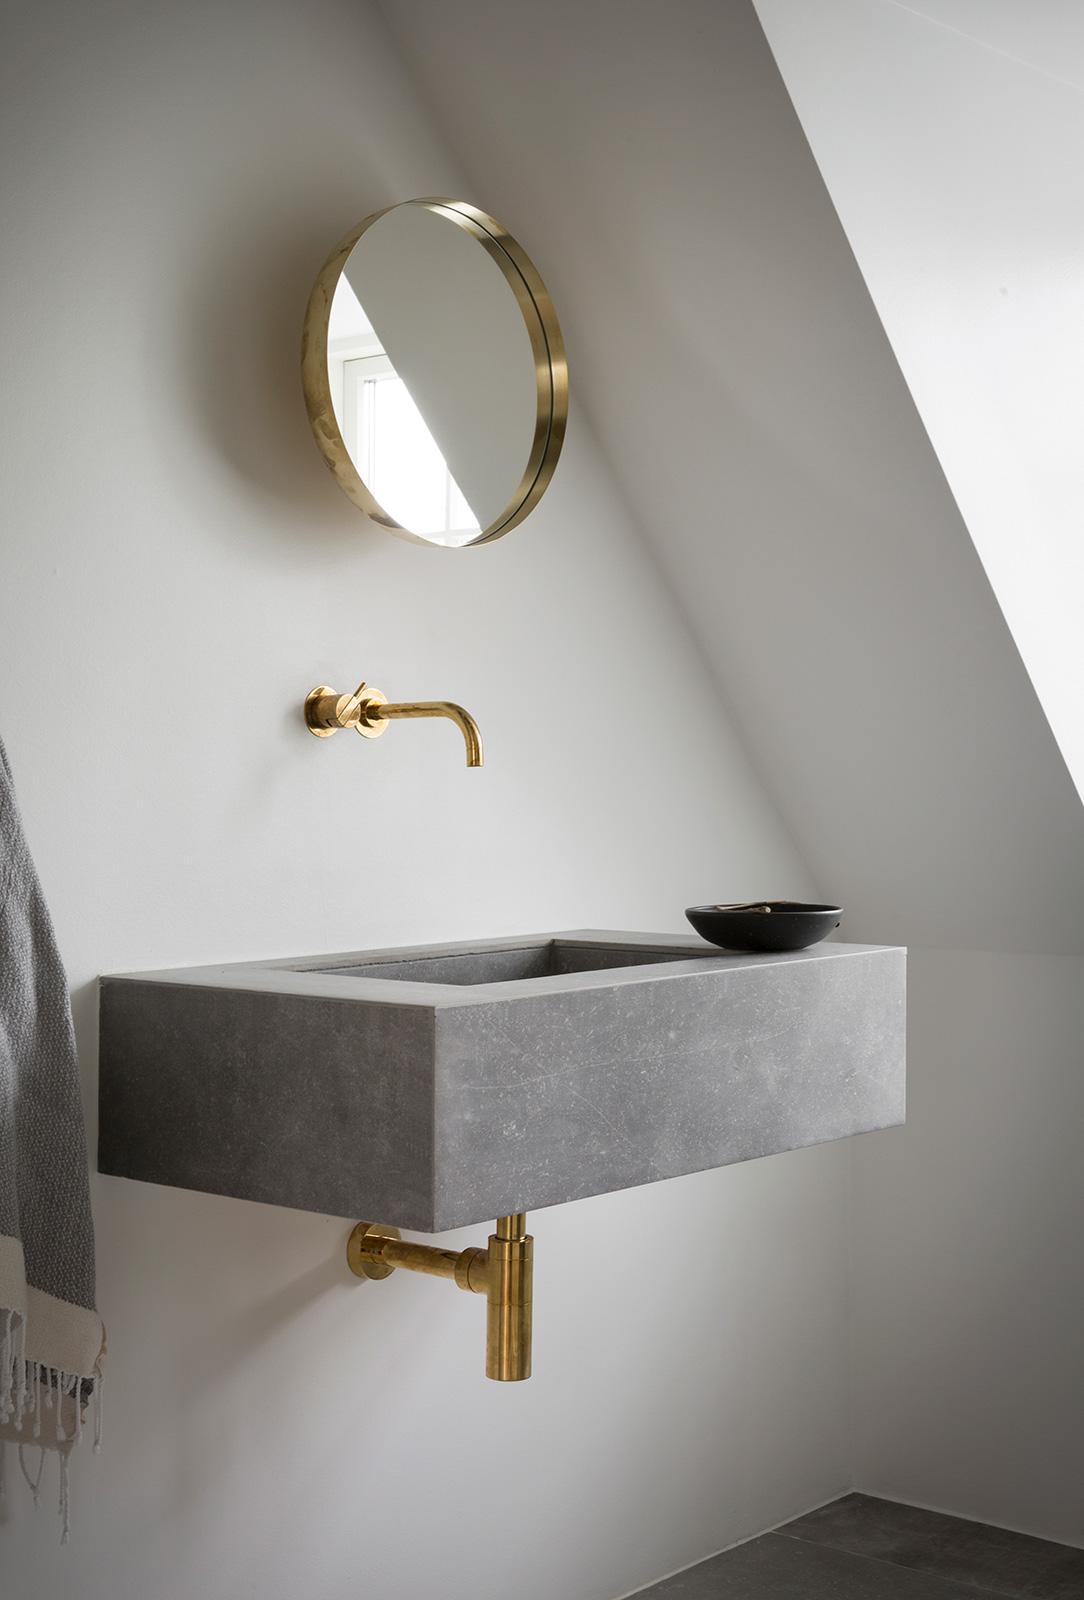 99 bathroom ideas small bathroom